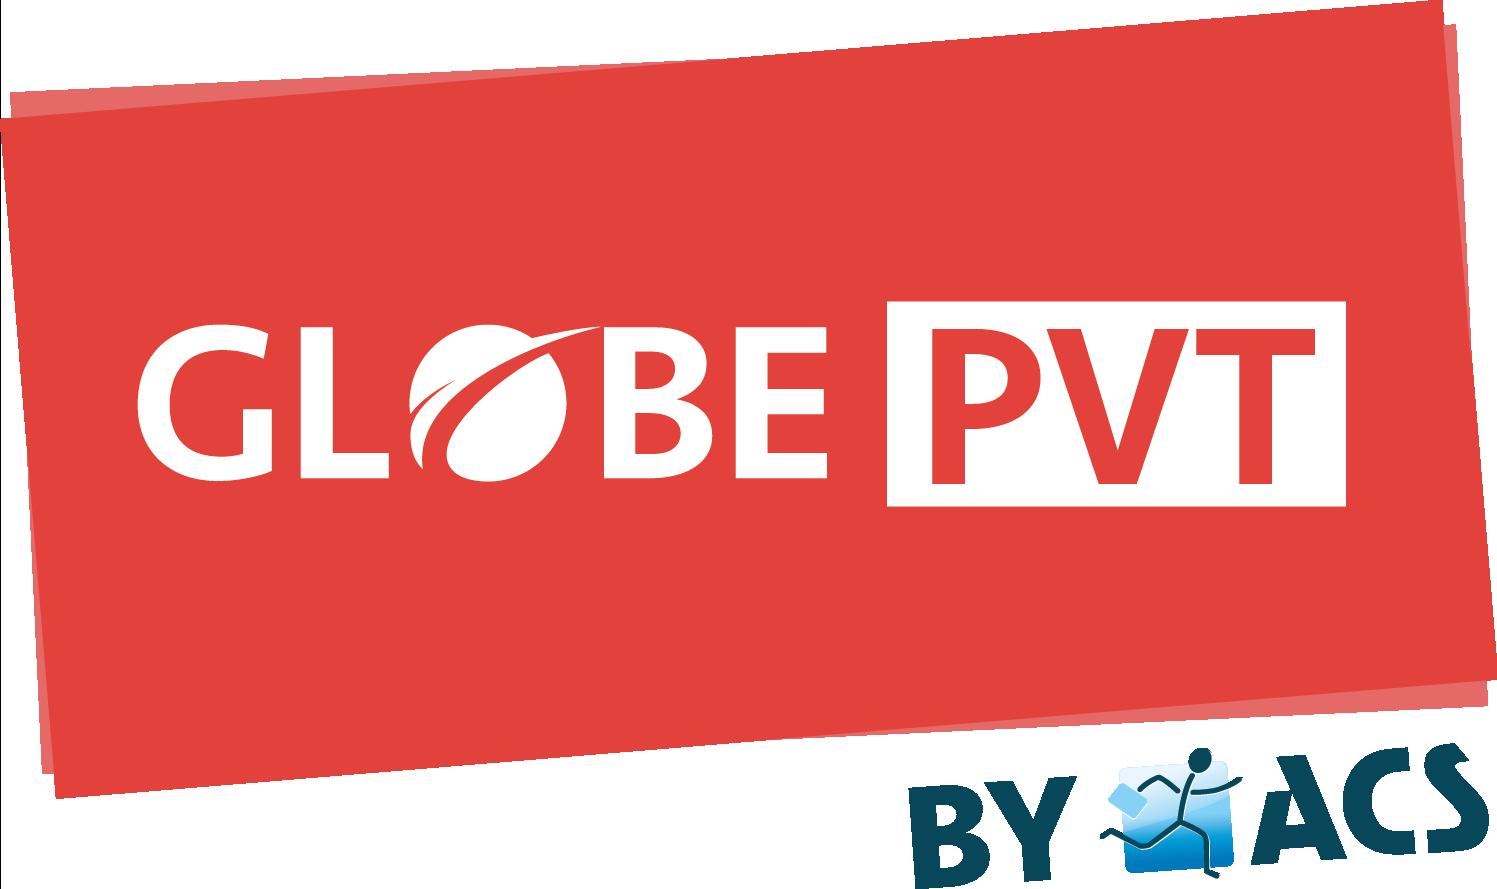 GlobePVT